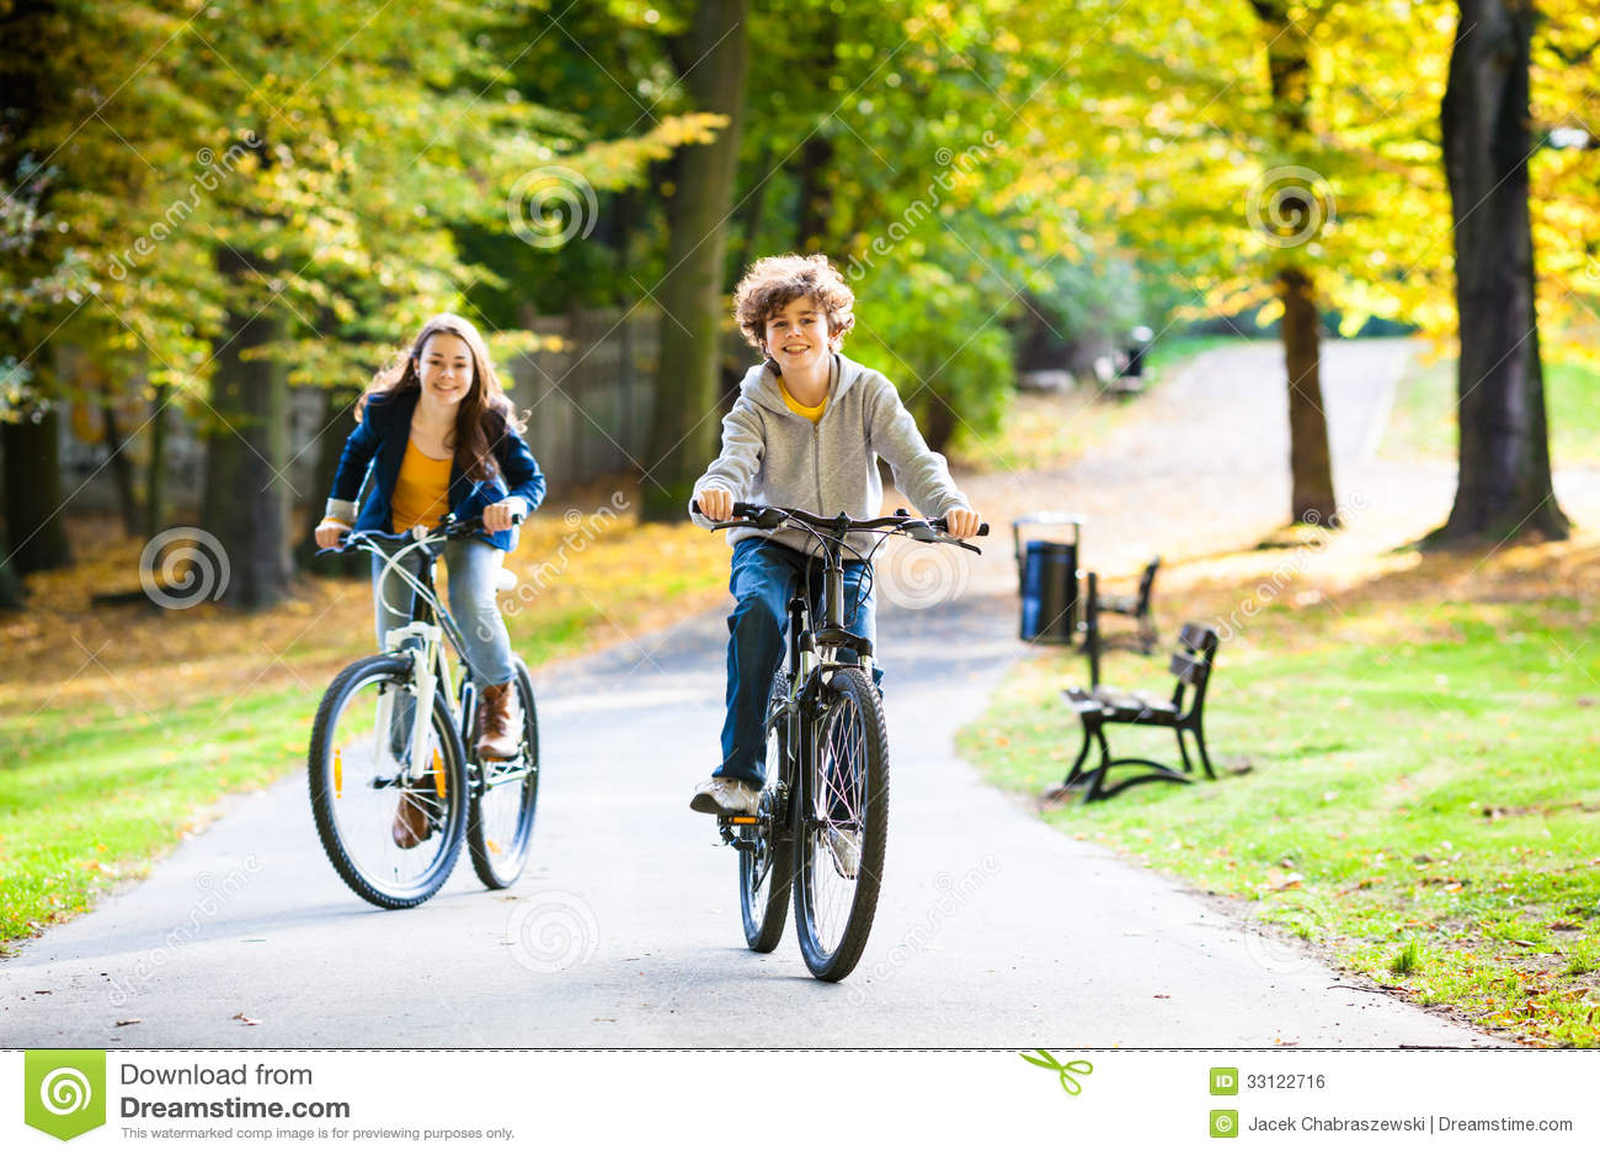 Teenage Girl And Boy Biking Royalty Free Stock Image ...